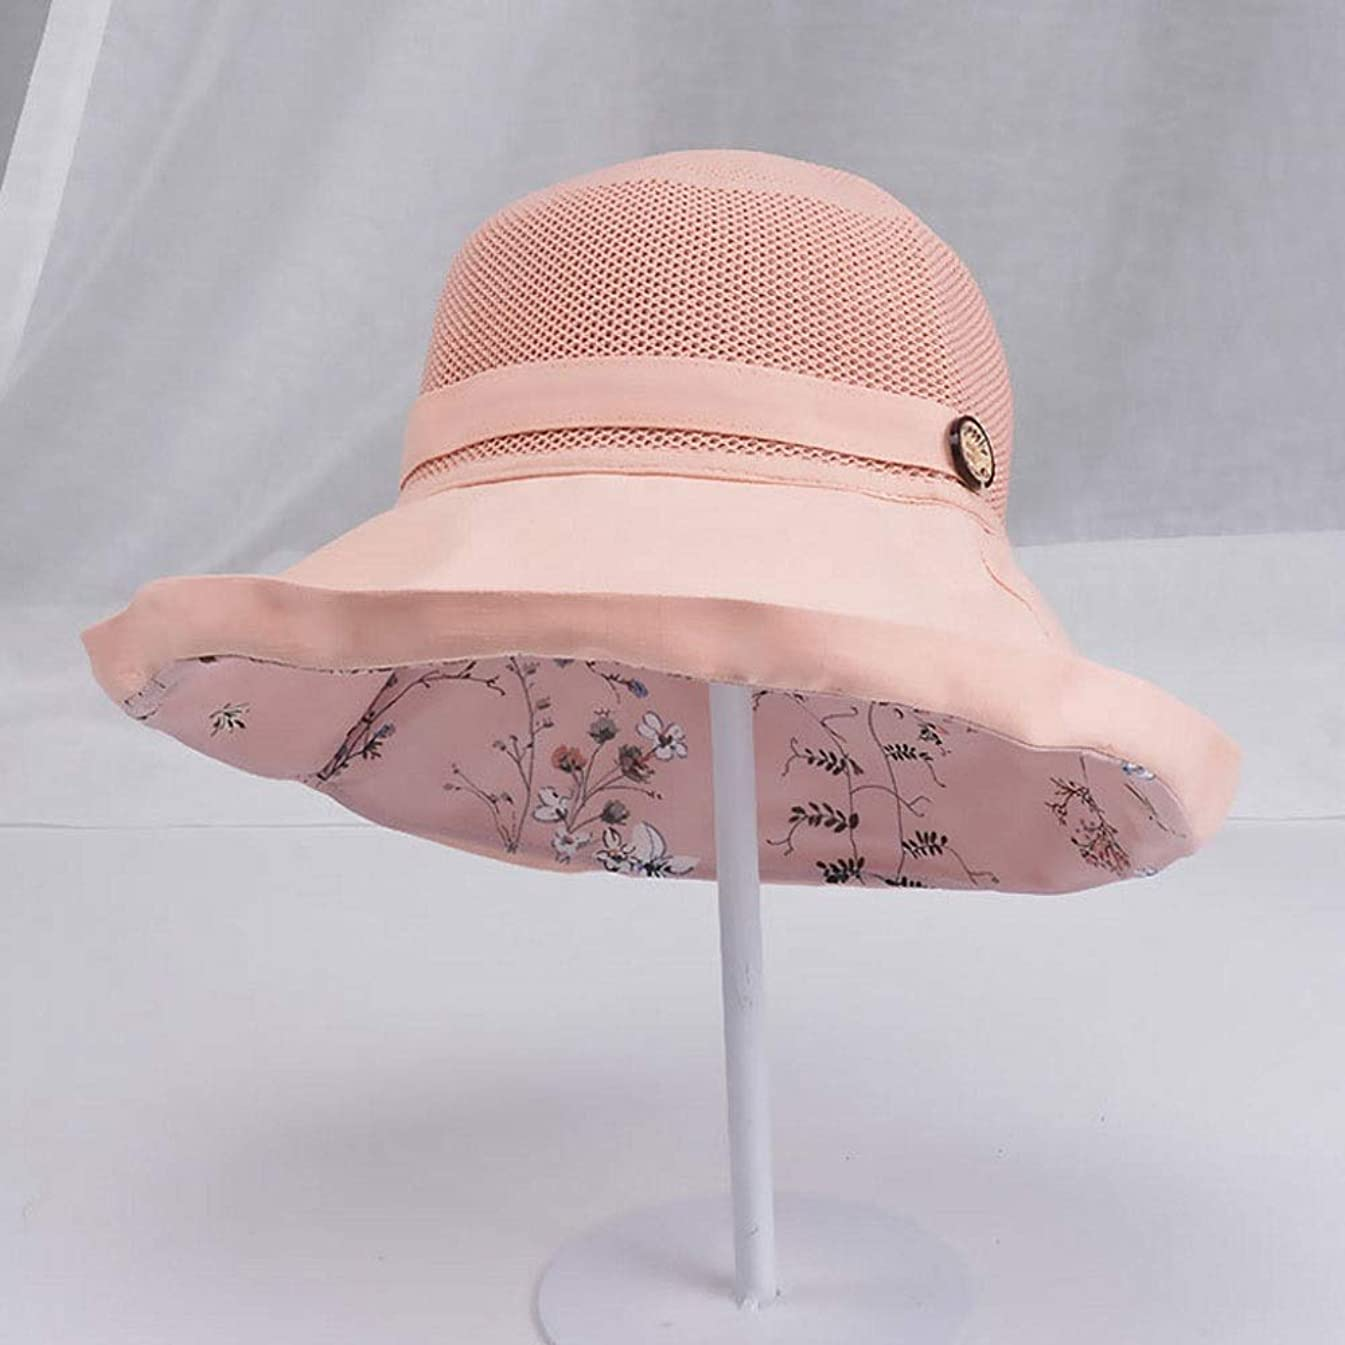 LDDENDP Foldable Fashion Basin Hat Spring and Summer Fisherman Hat Wide-brimmed Sun Hat, Fisherman Hat, Outdoor Camping Hiking, Sun Visor Cap, Men's Summer Windproof Fishing Cap UPF 50+ UV Protection